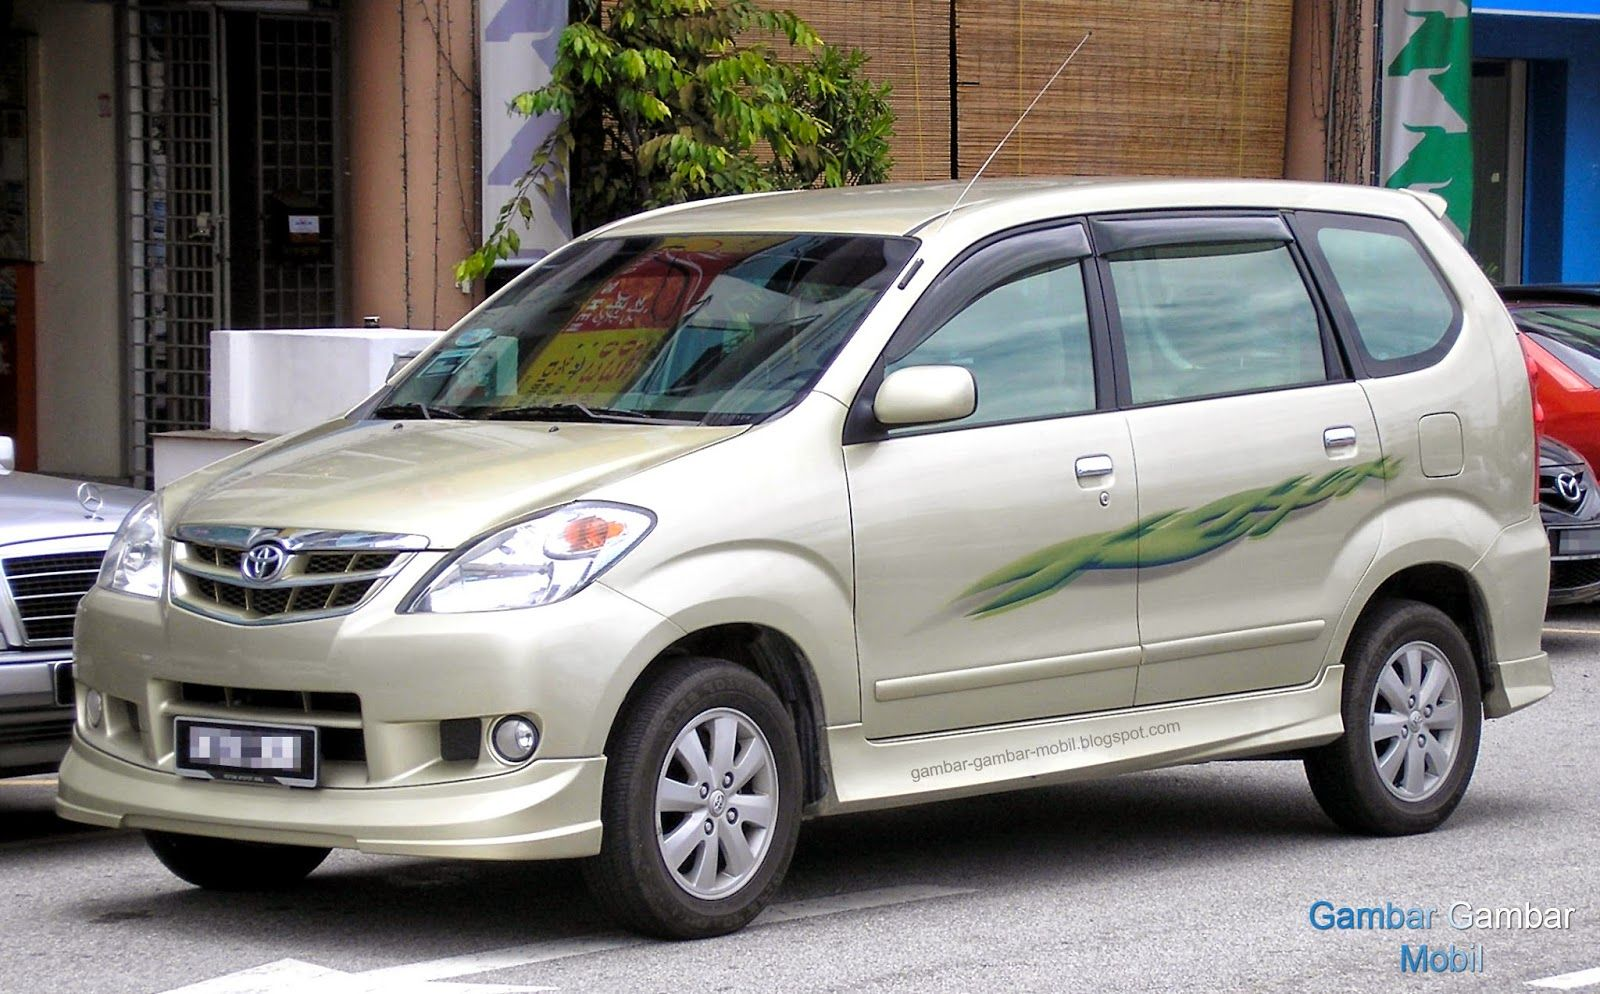 Gambar Mobil Avanza New Gambar Gambar Mobil Mobil Toyota Gambar